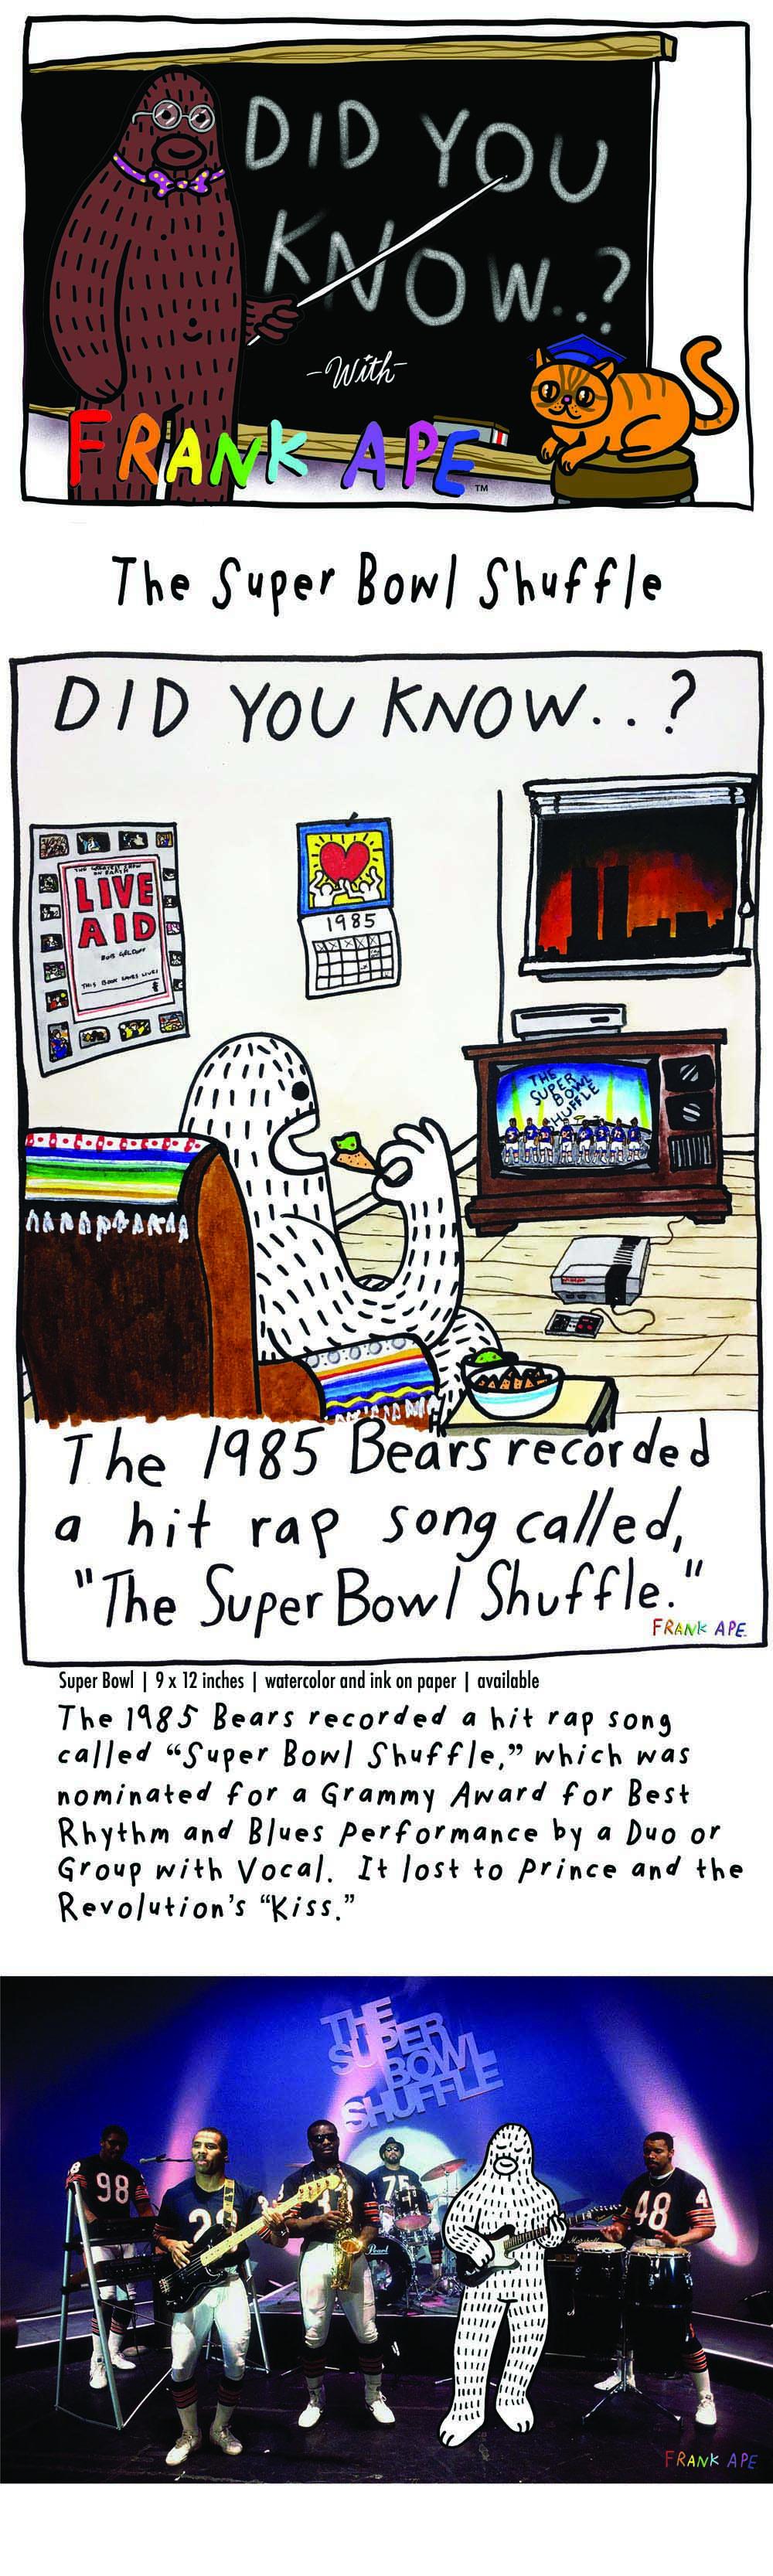 DYK - Super Bowl - Brandon Sines - Frank Ape - Feb 3 copy.jpg